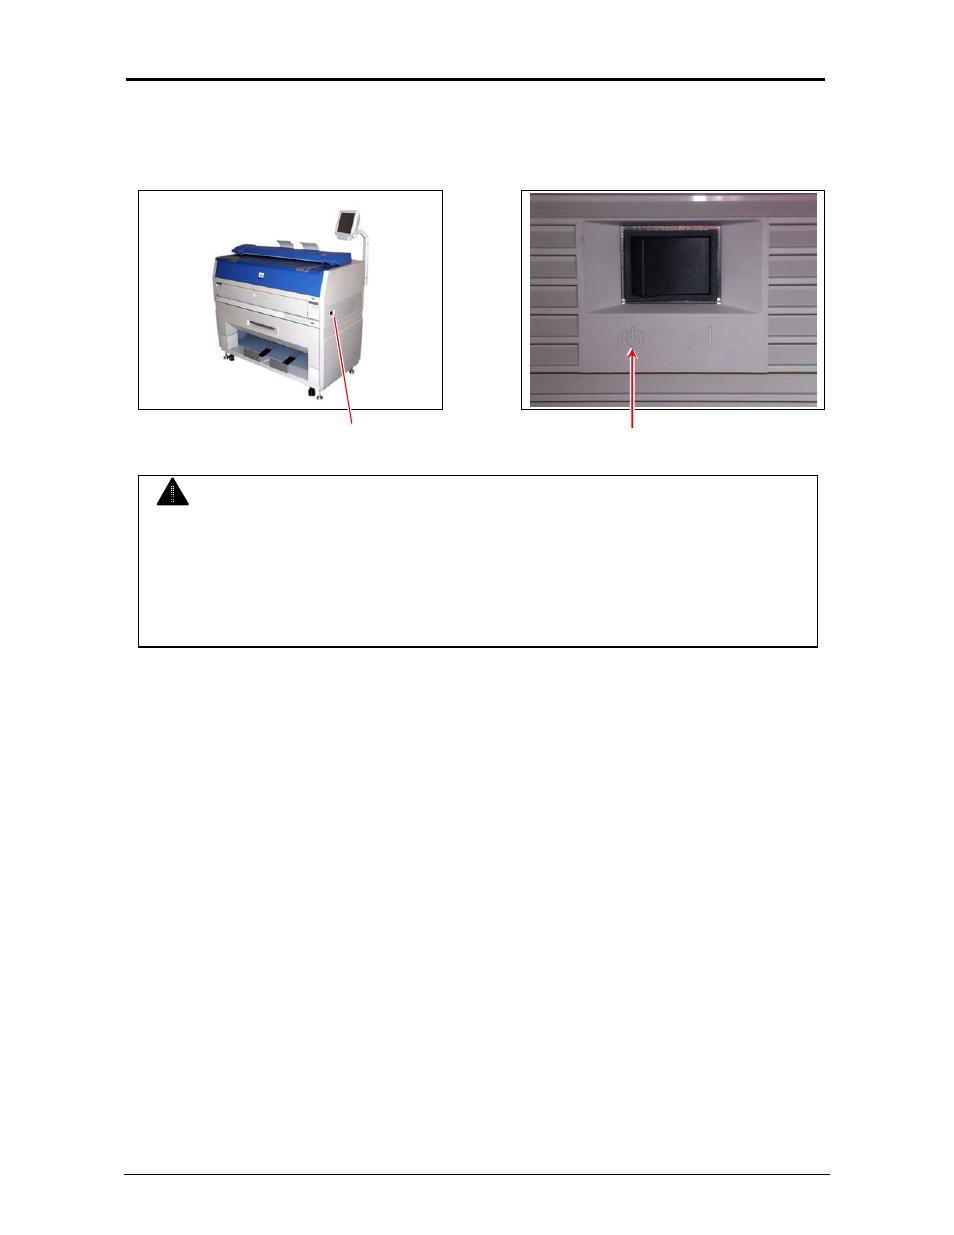 caution konica minolta kip 3100 user manual page 24 56 rh manualsdir com kip 3100 service manual pdf kip 3100 printer manual